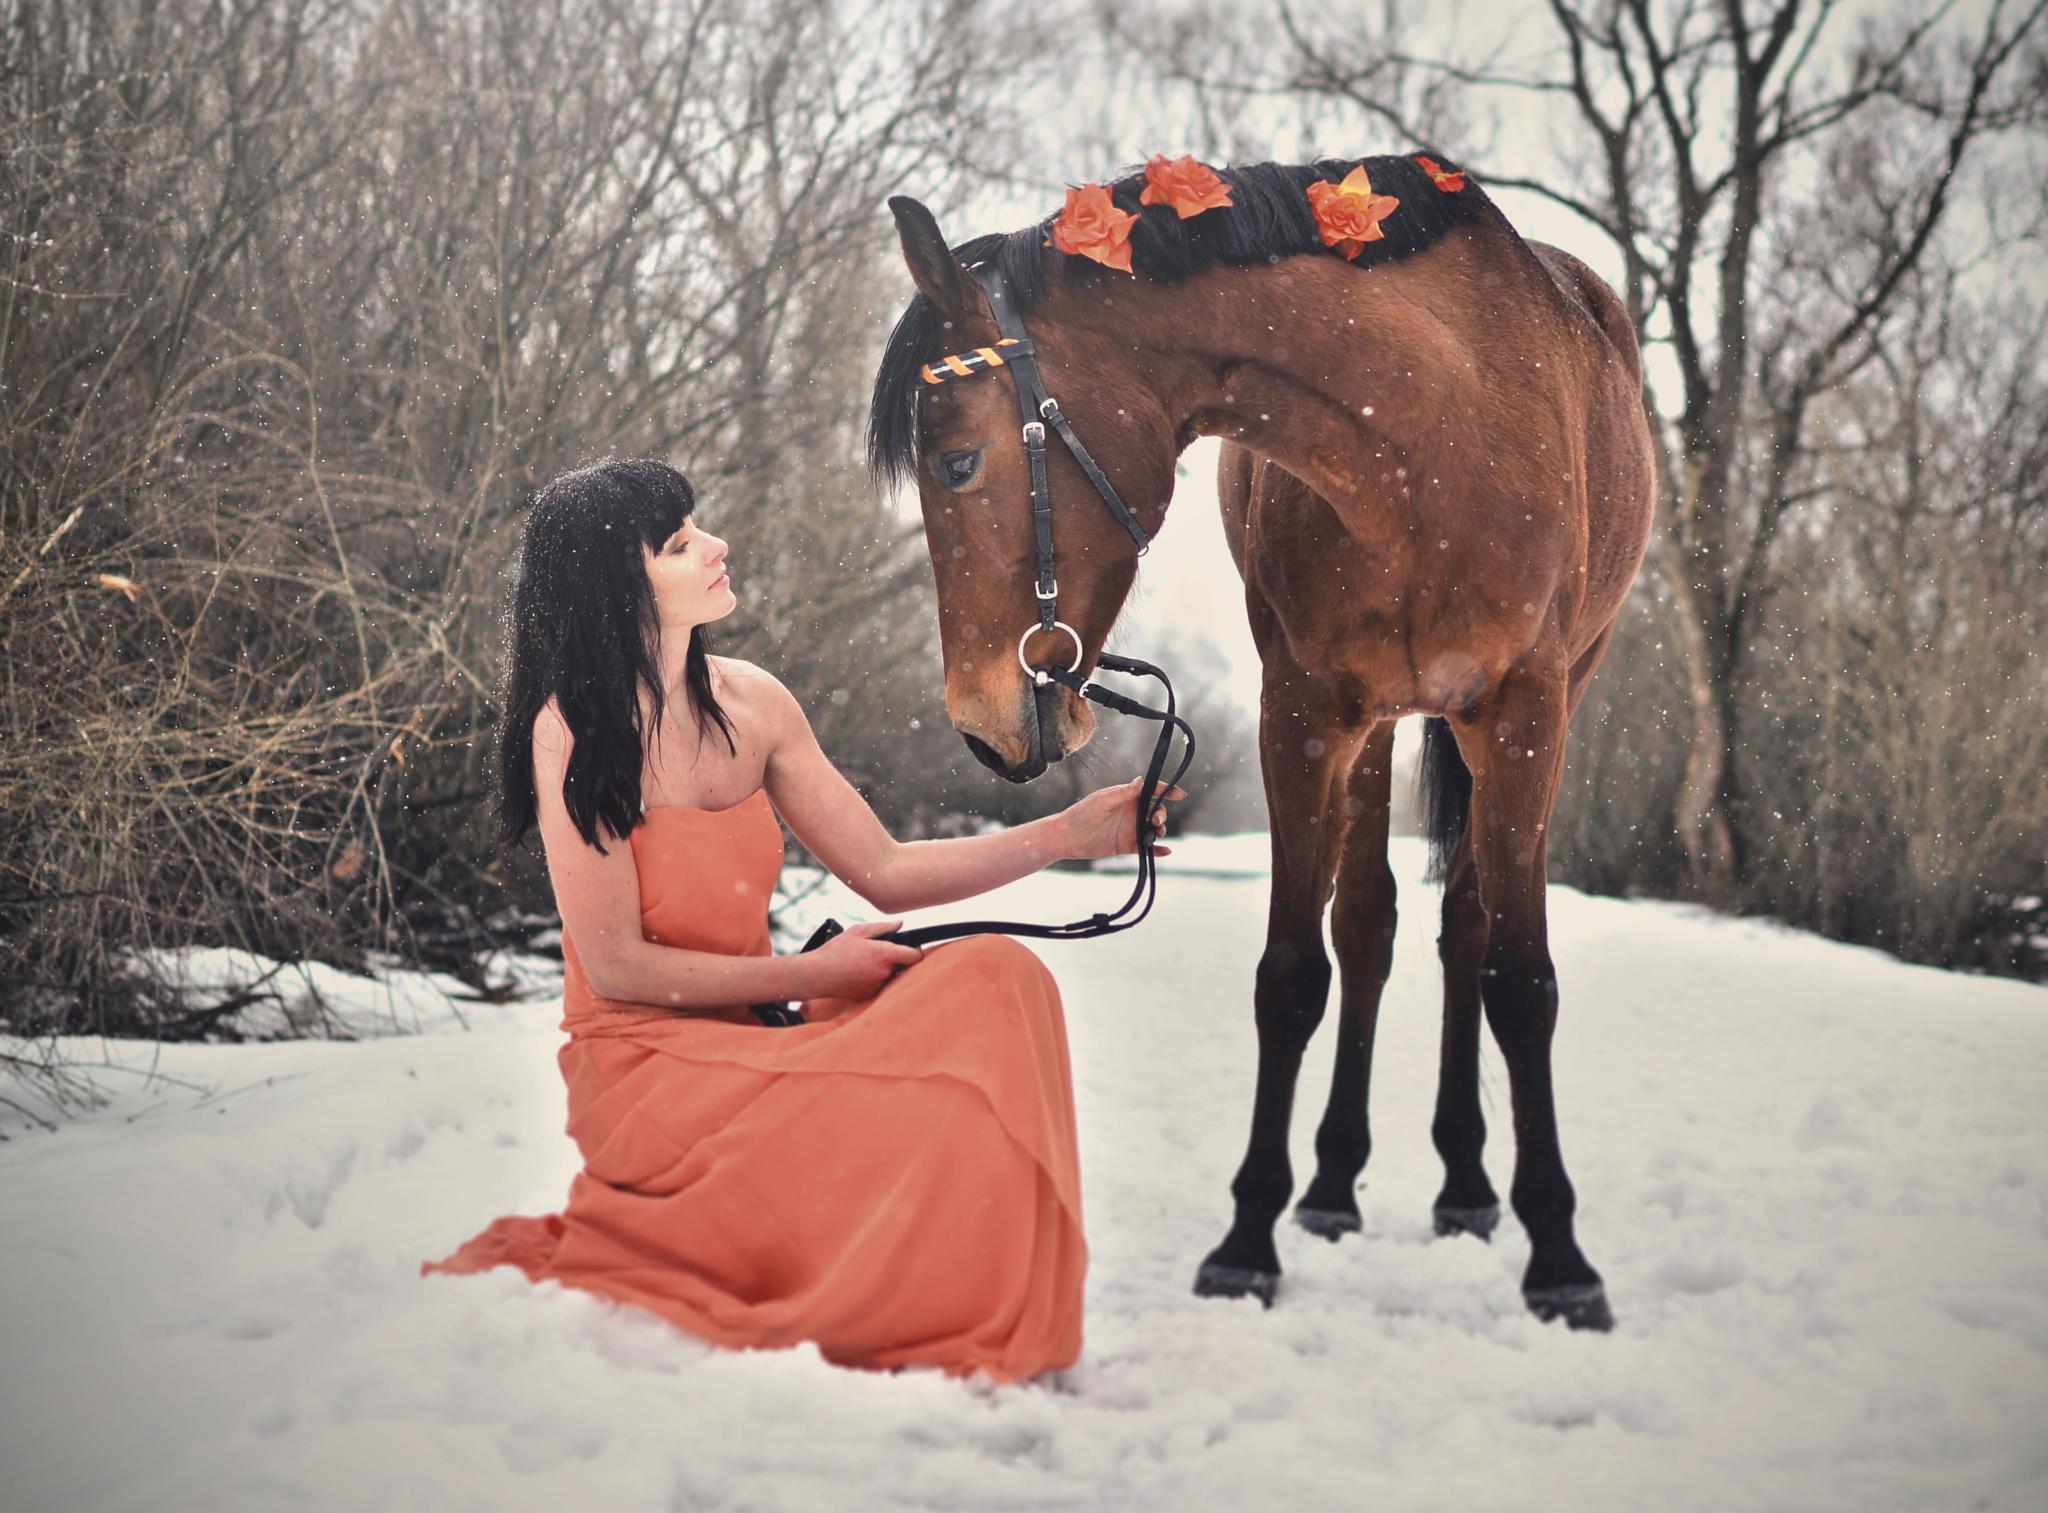 journée en orange by Anna P